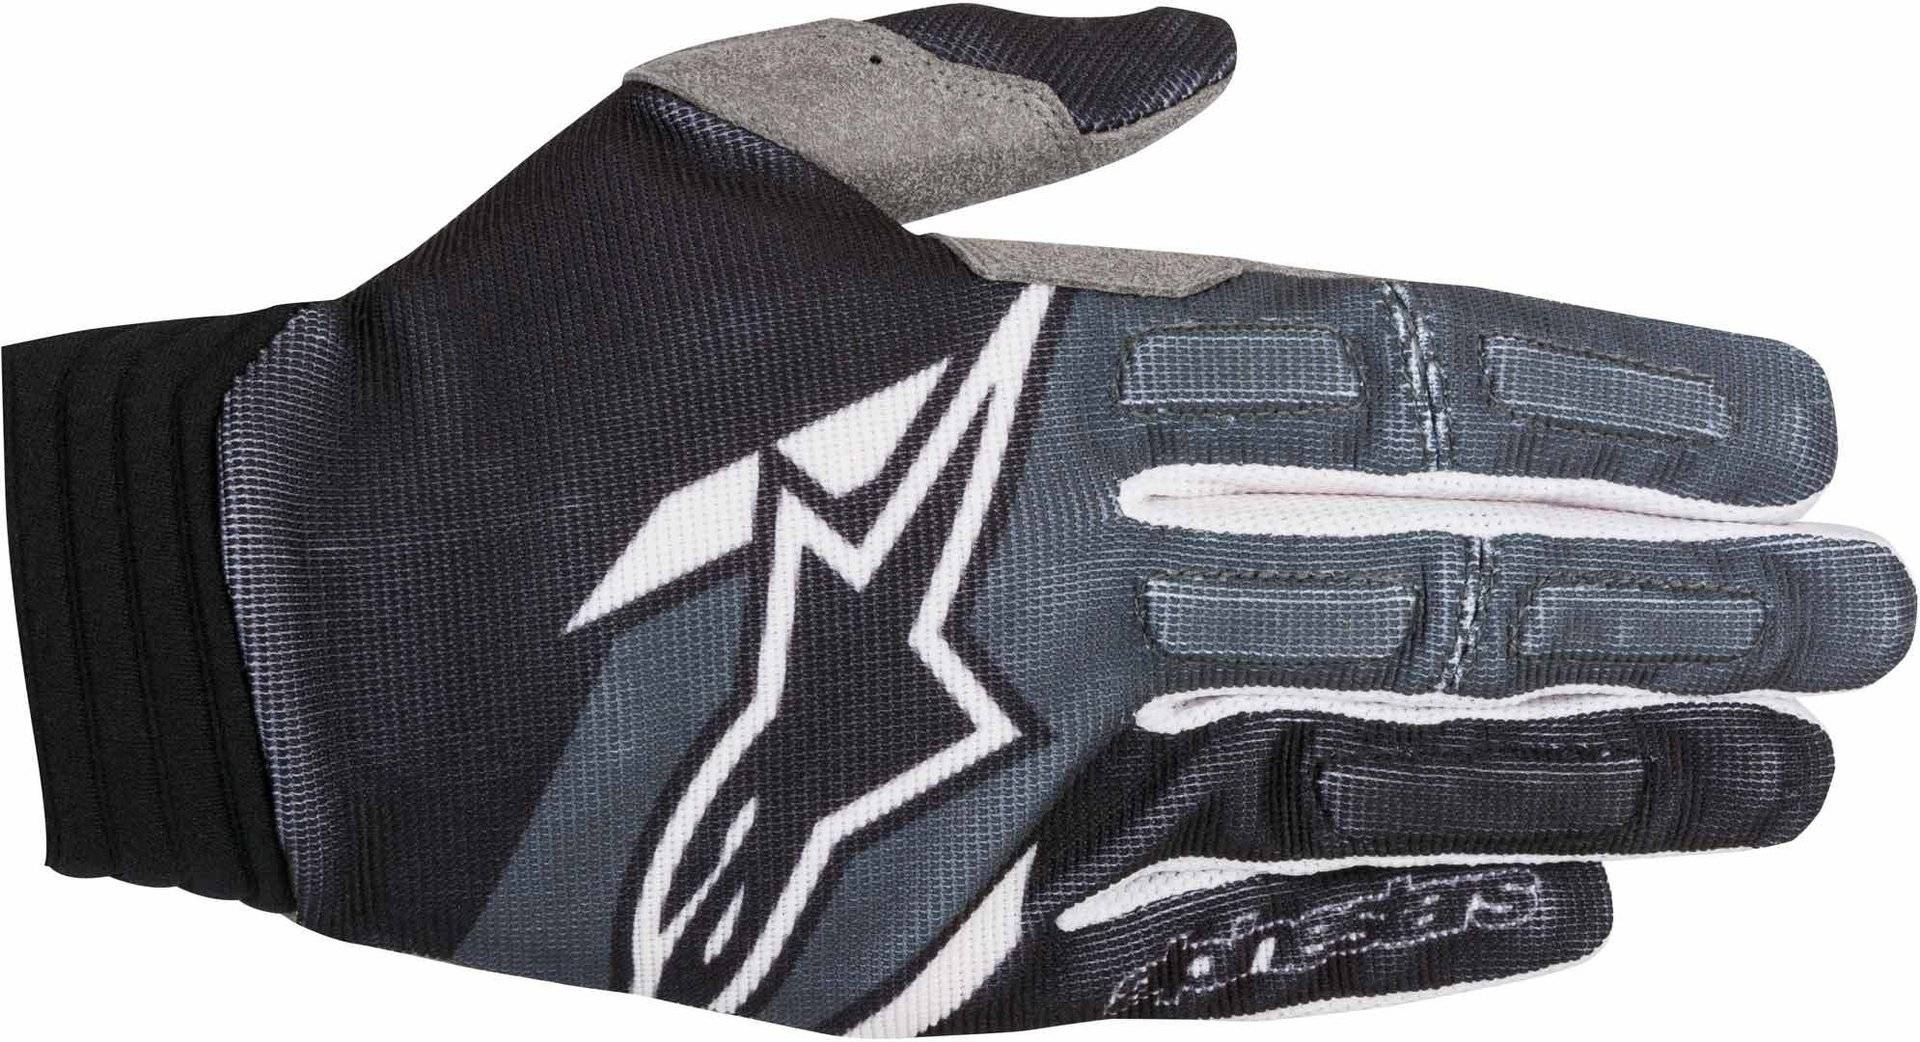 Alpinestars Aviator Gloves 2018 Black Grey White S